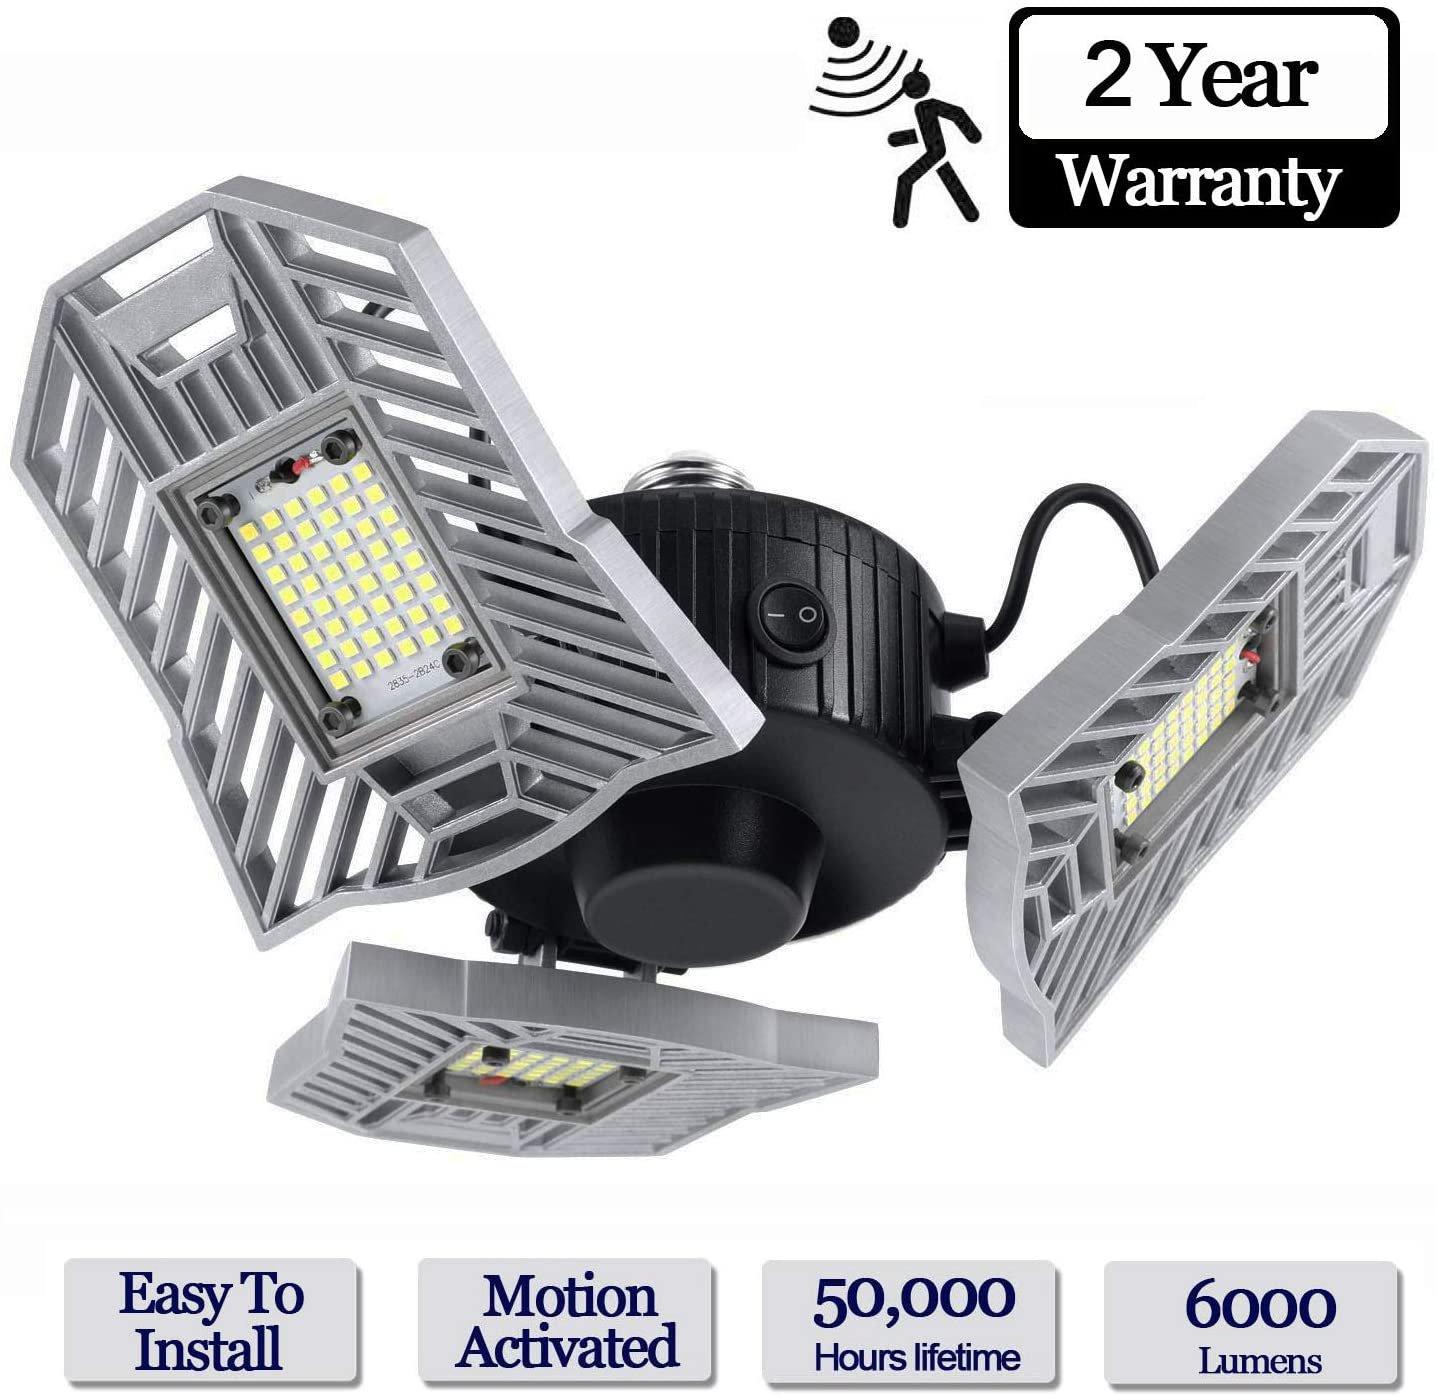 LED Garage Lights, 60W 6000LM Motion Activated LED Garage Ceiling Light Bulbs